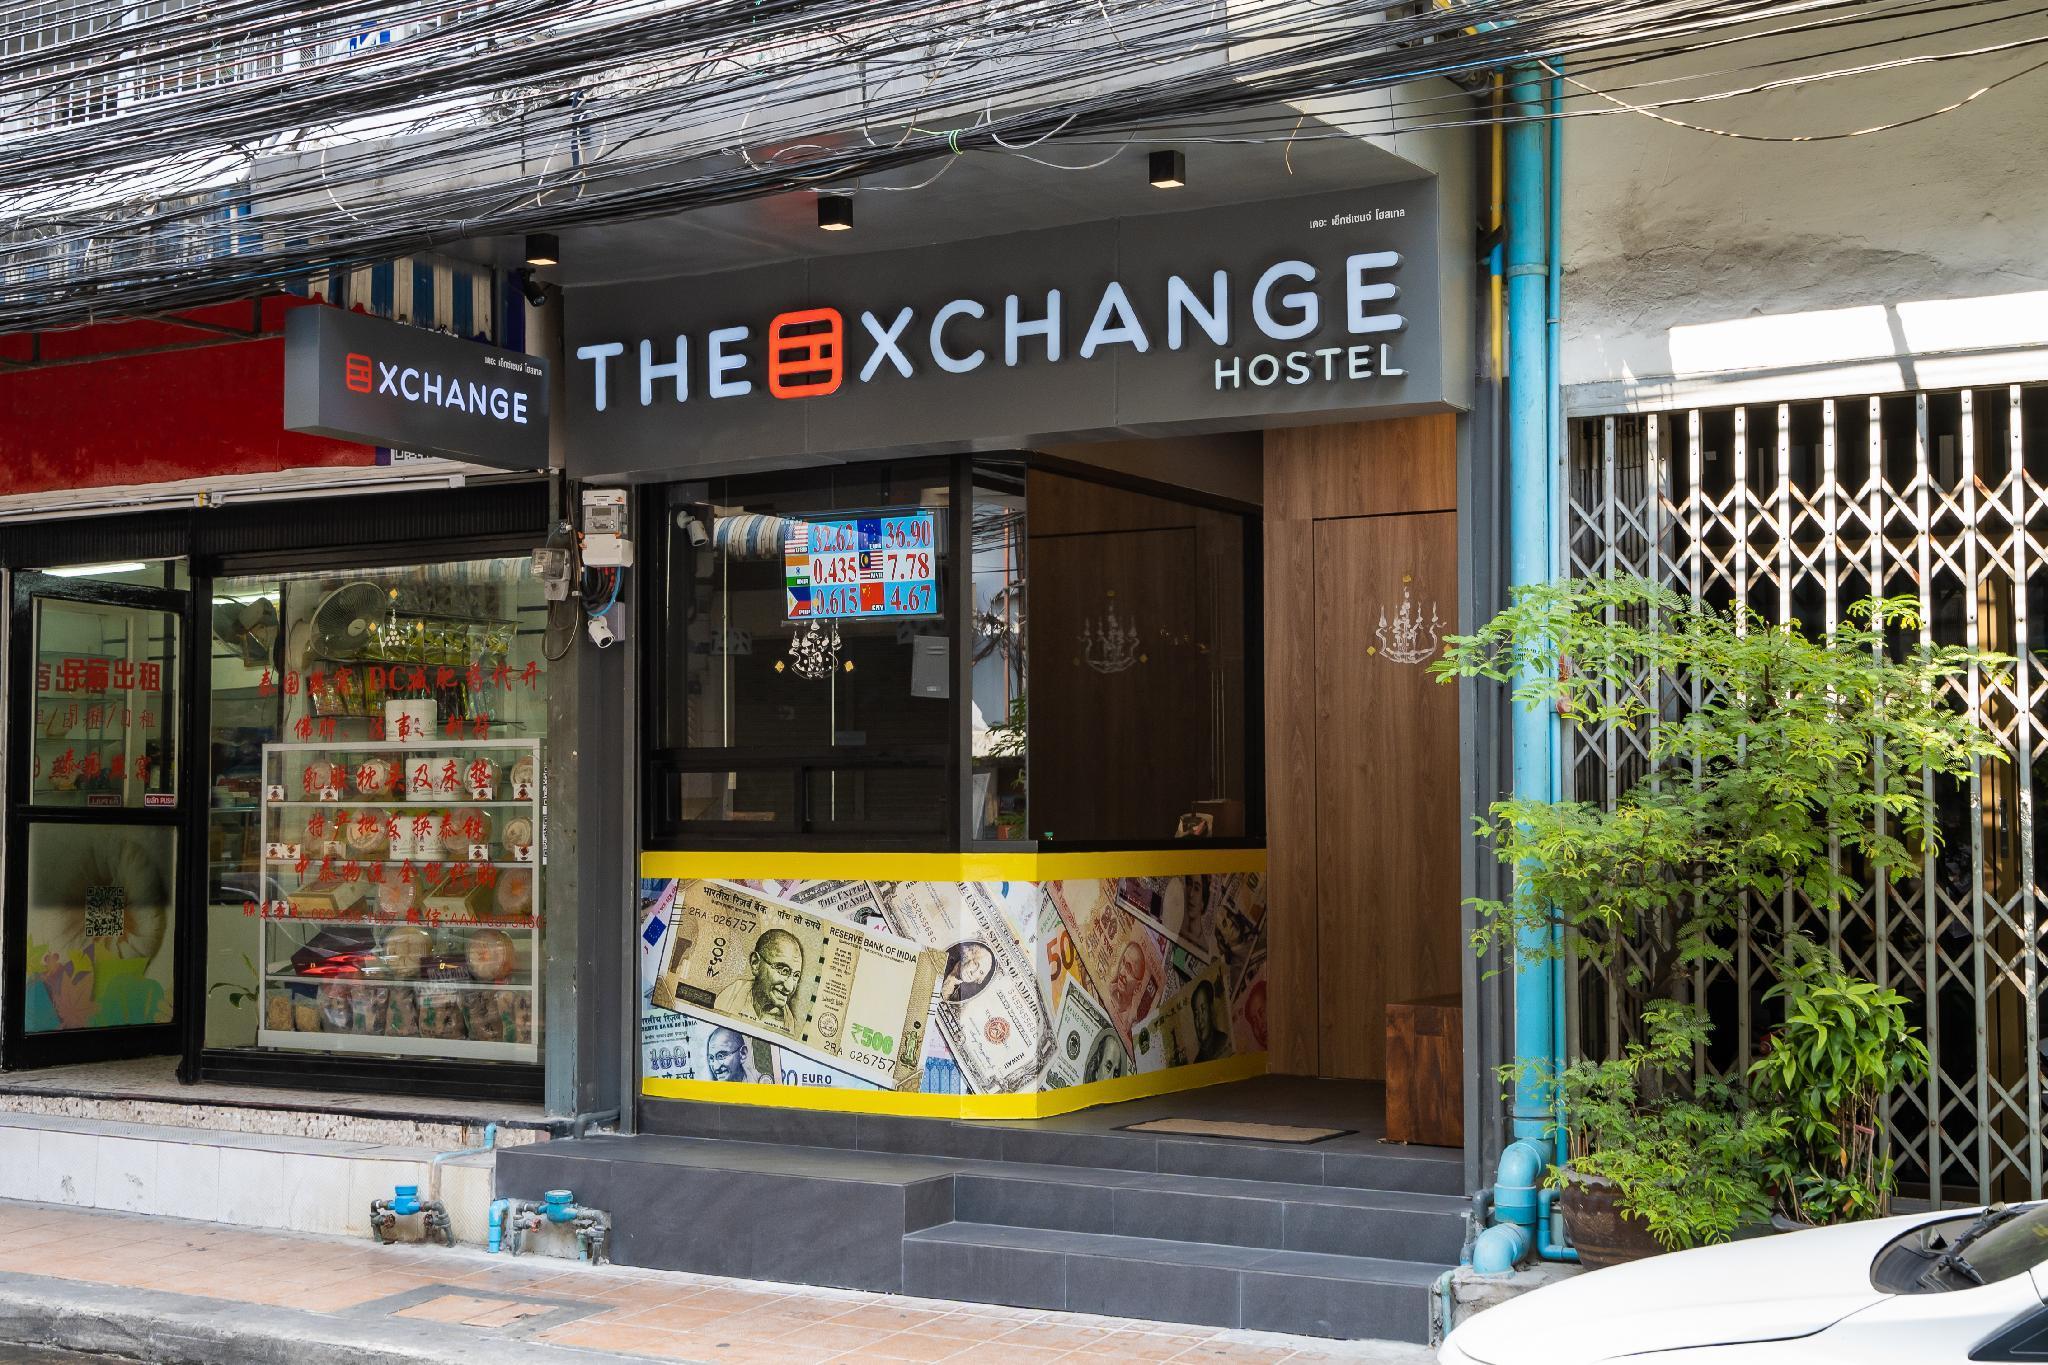 The Exchange Hostel Bangkok